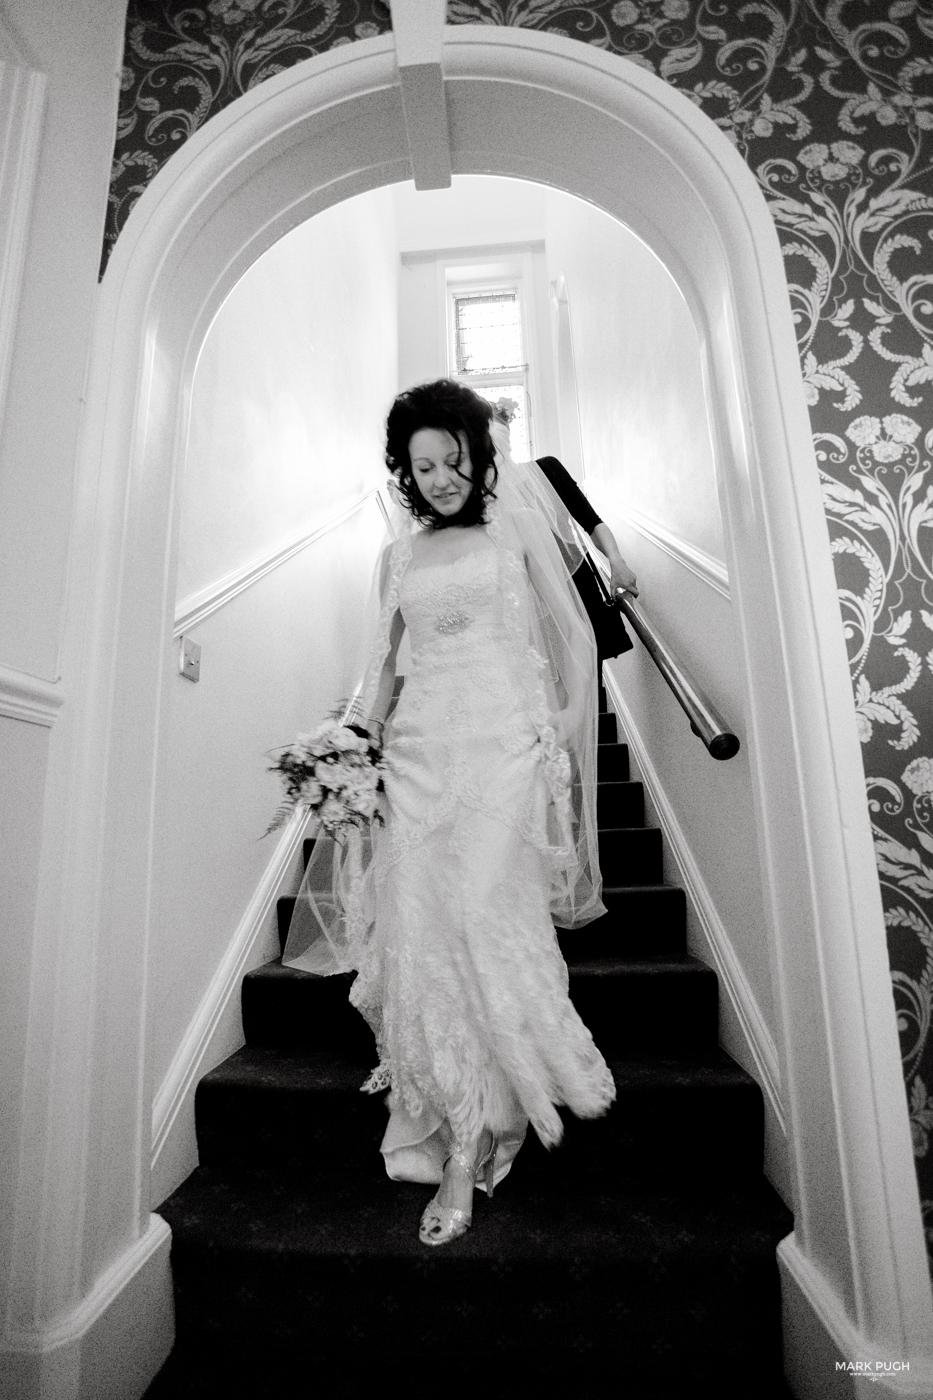 228 Wedding Photography Award winning Wedding Photographer and Videographer Mark Pugh www.markpugh.com.JPG